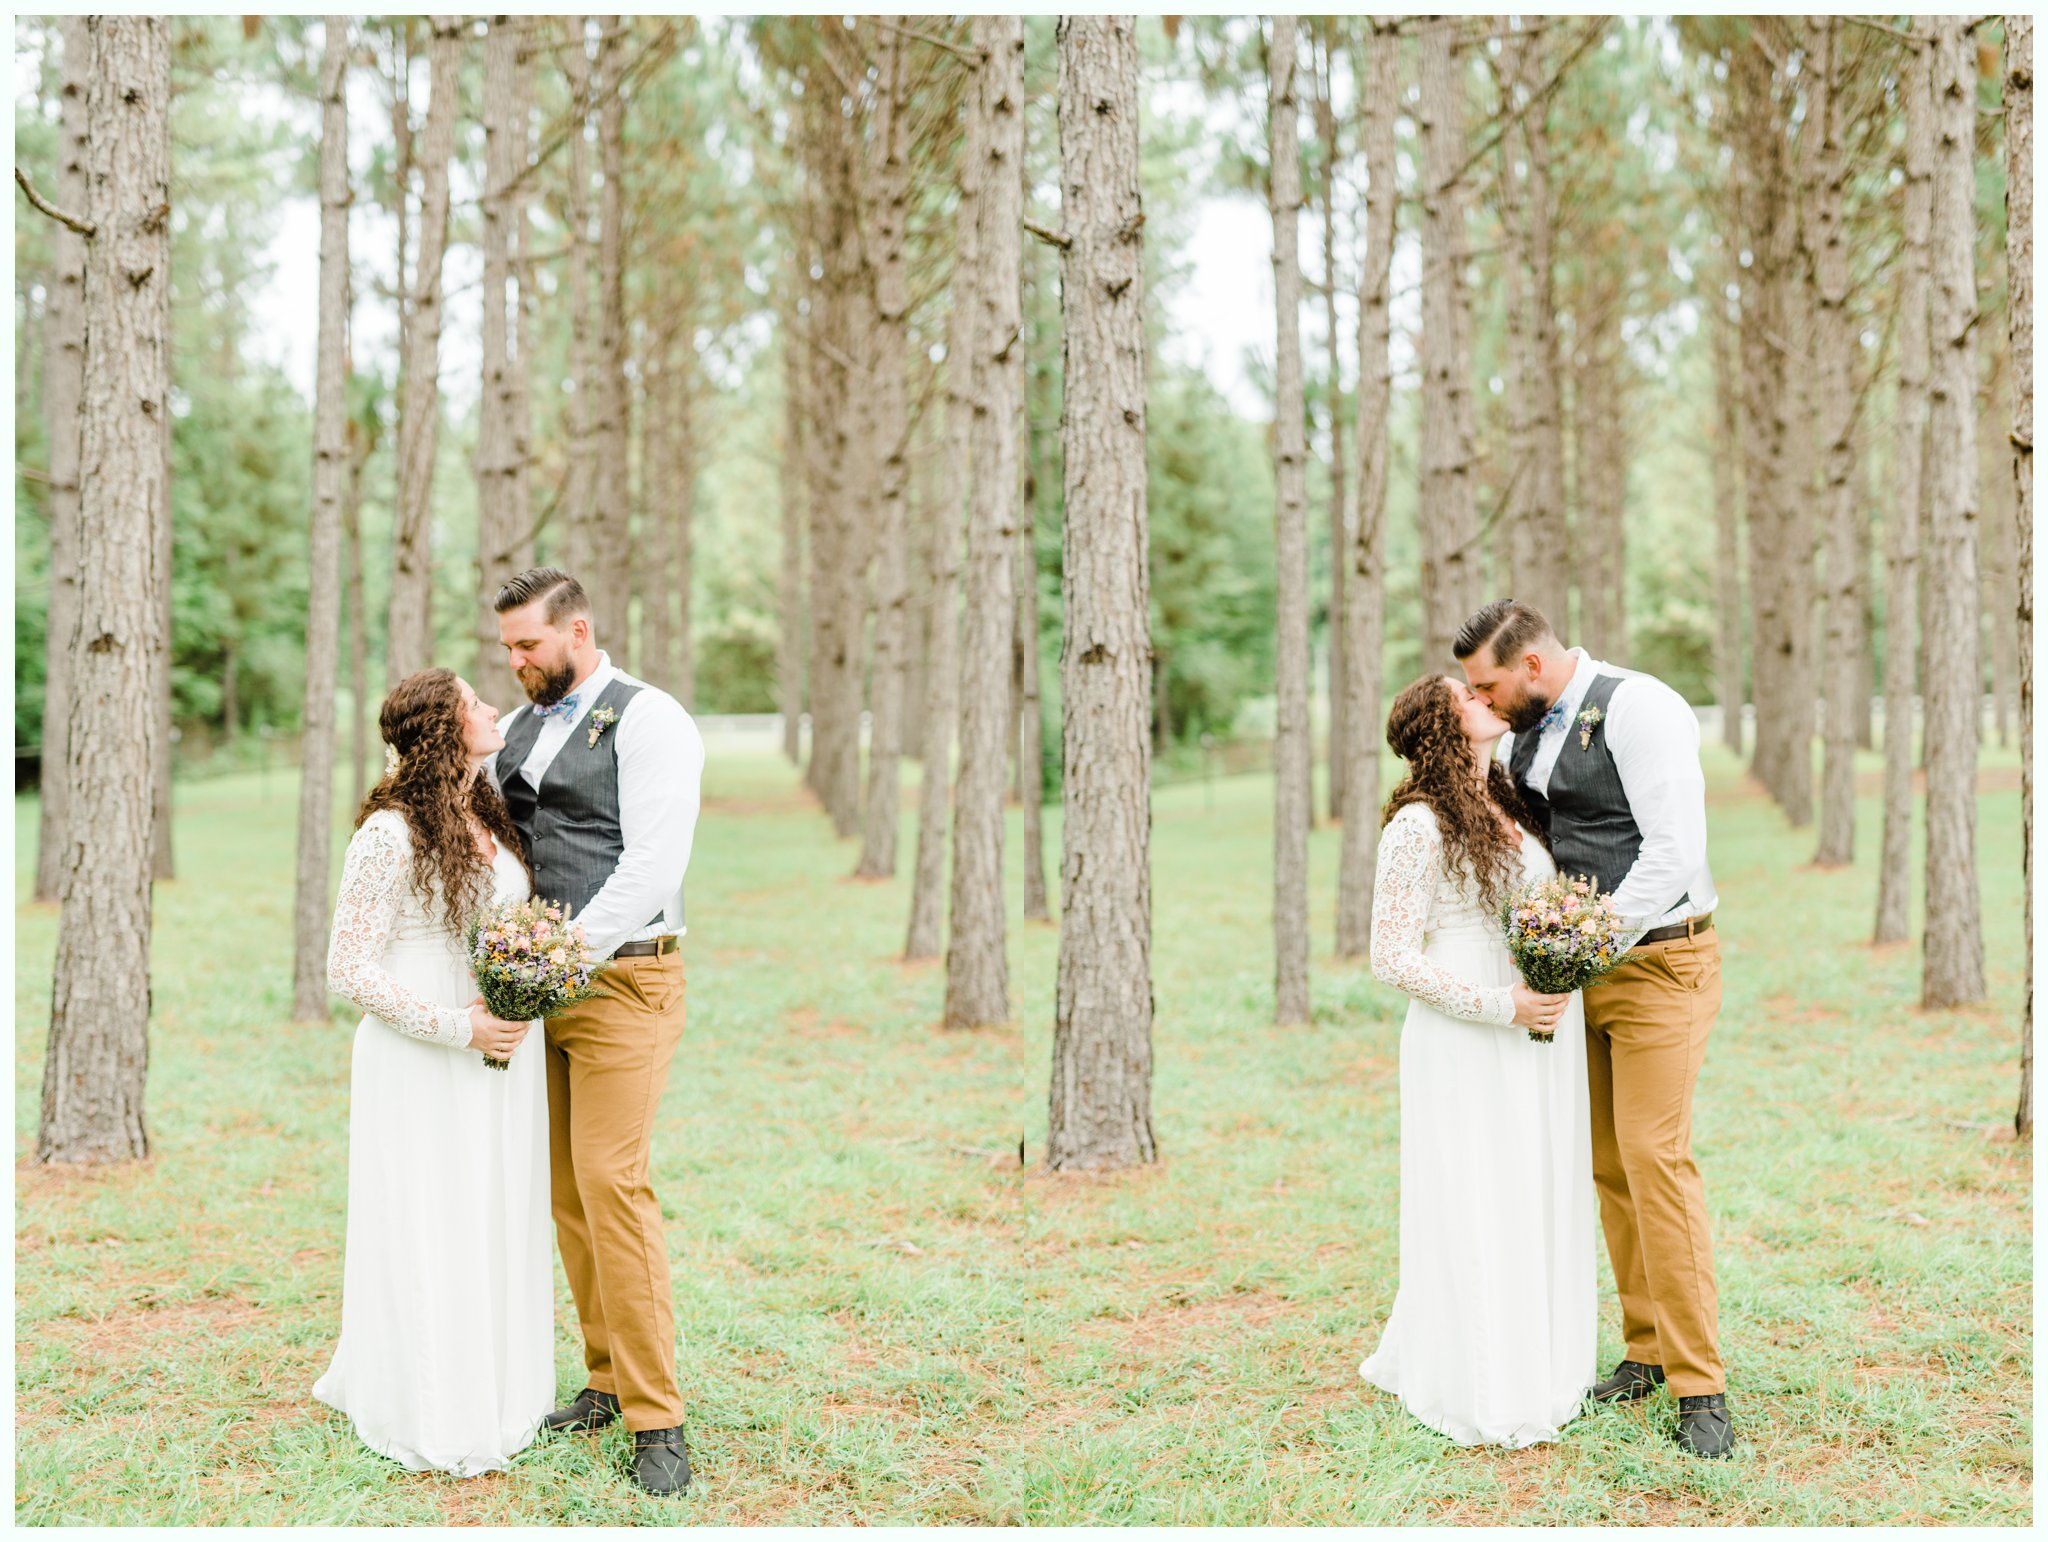 Jake&rhondawedding_5233.jpg